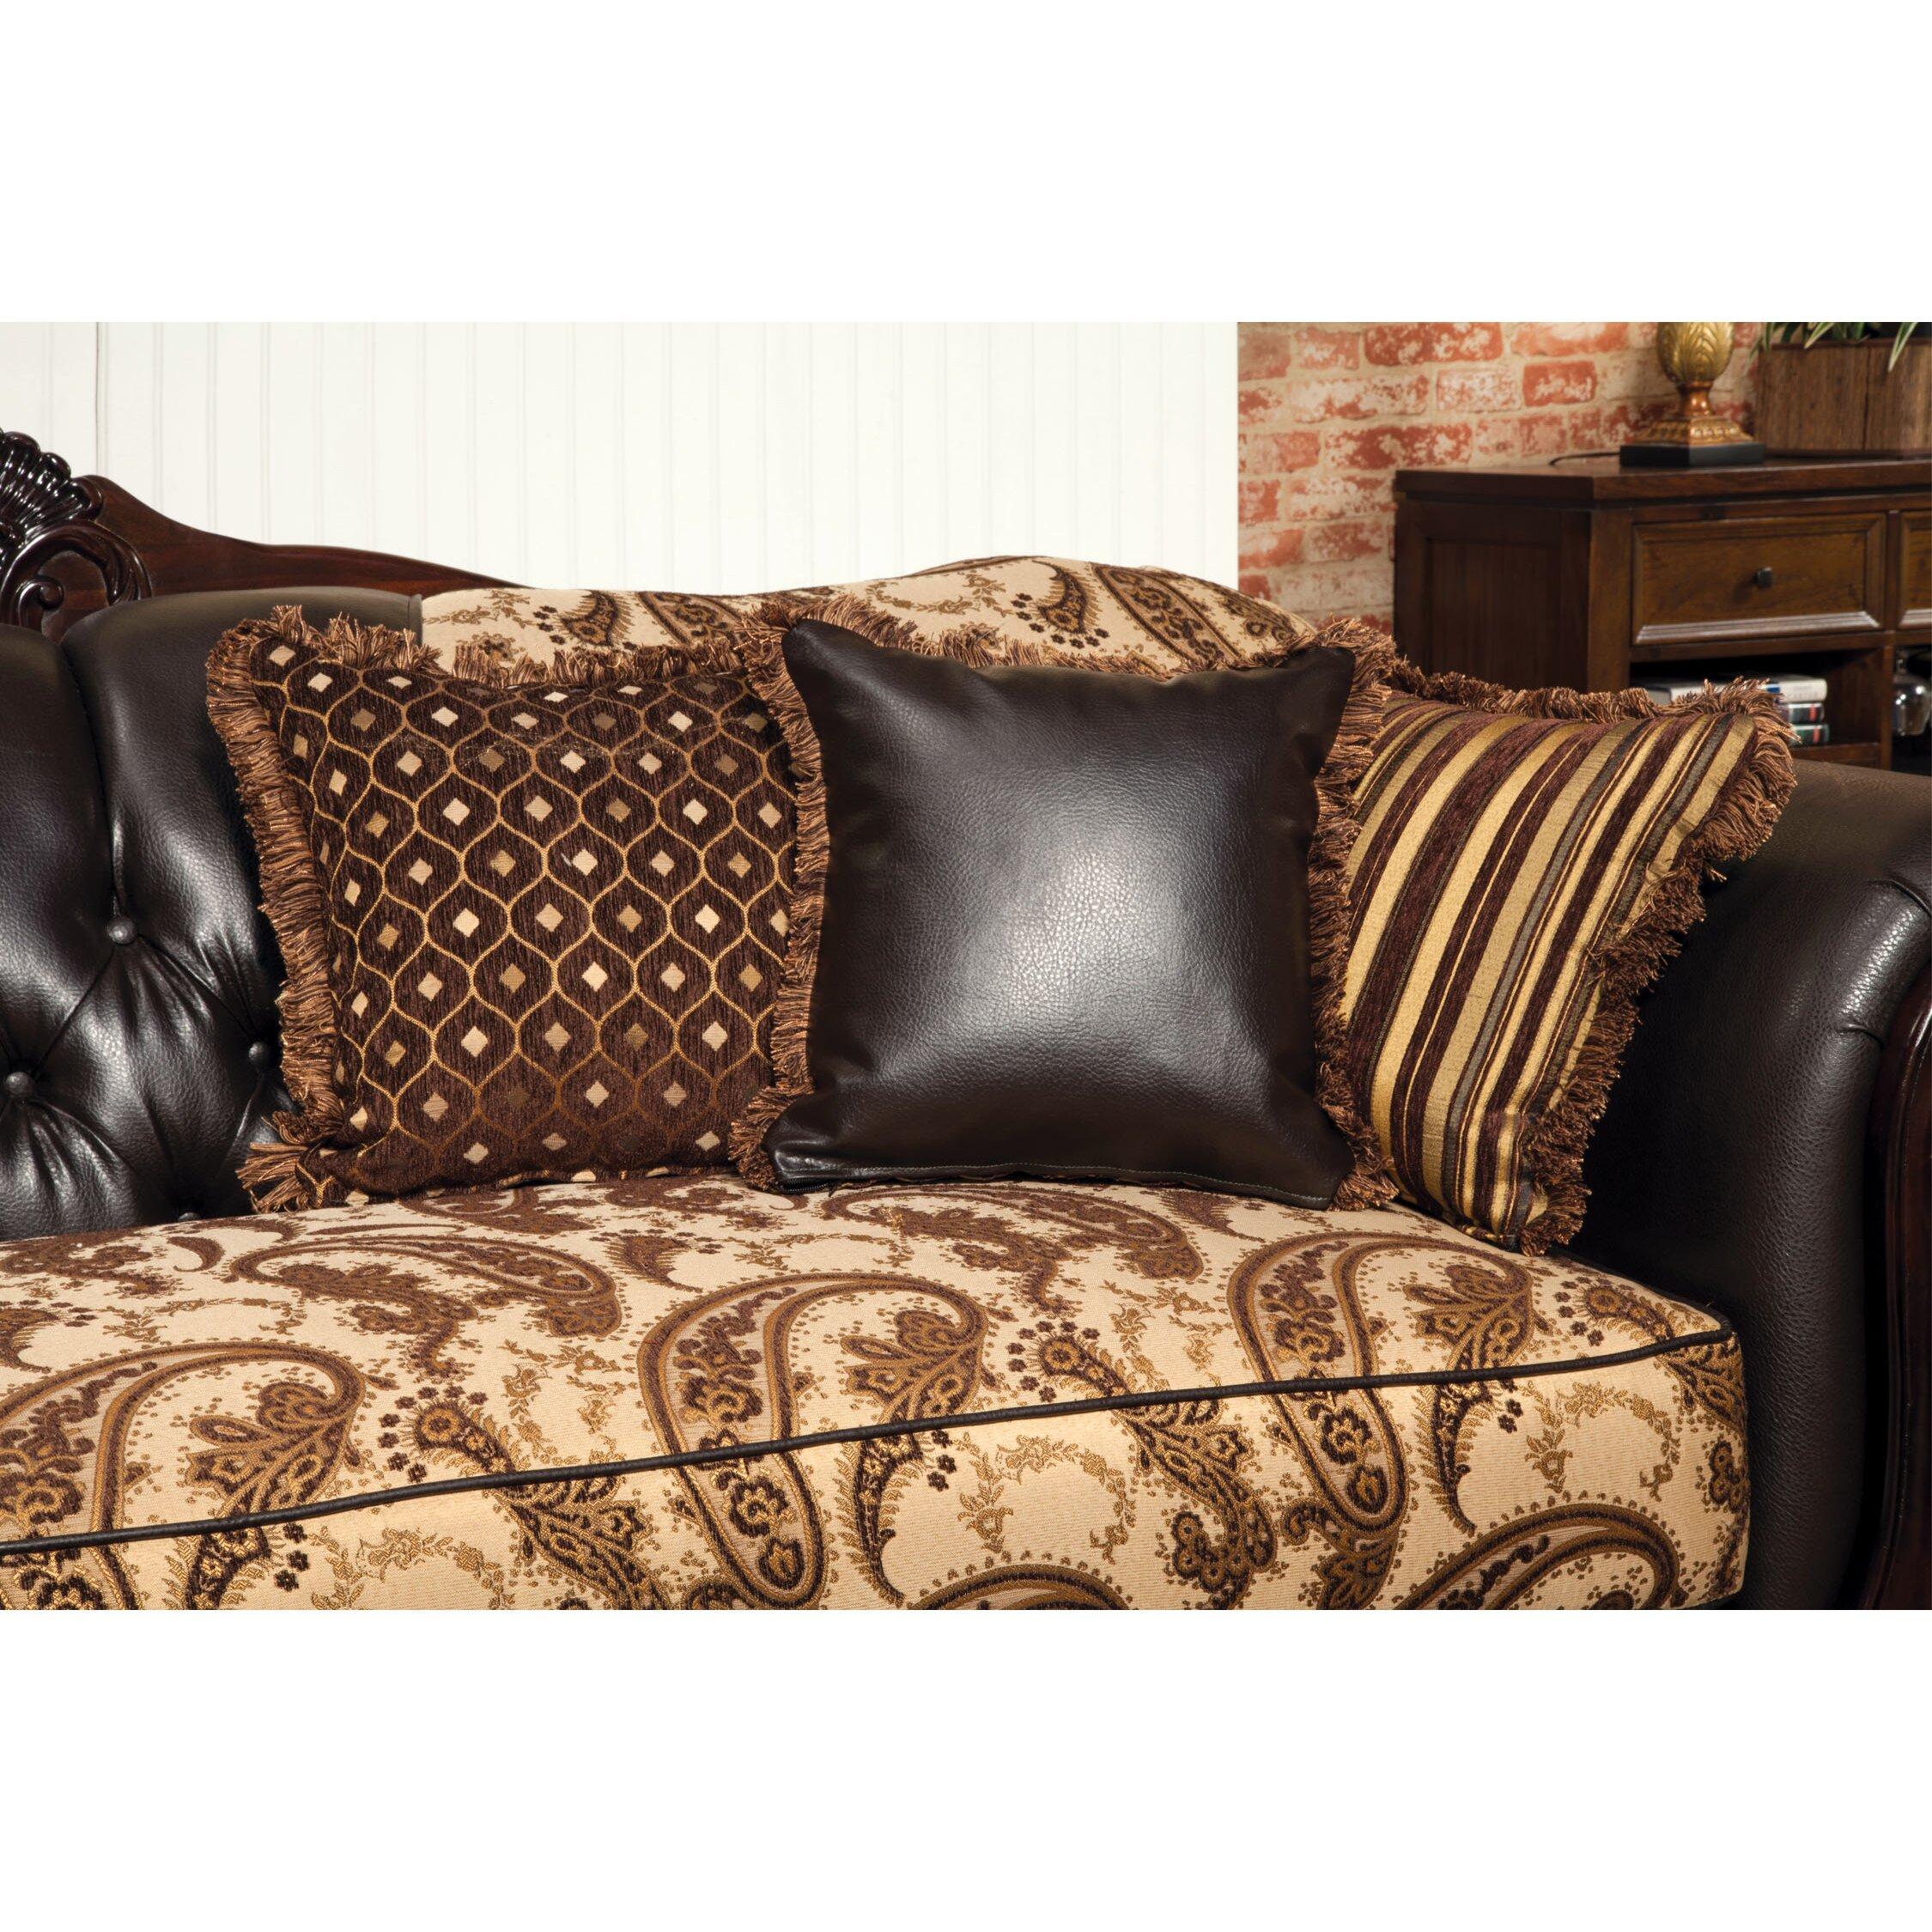 Hokku designs maximillia two tone classic sofa reviews for Classic sofa